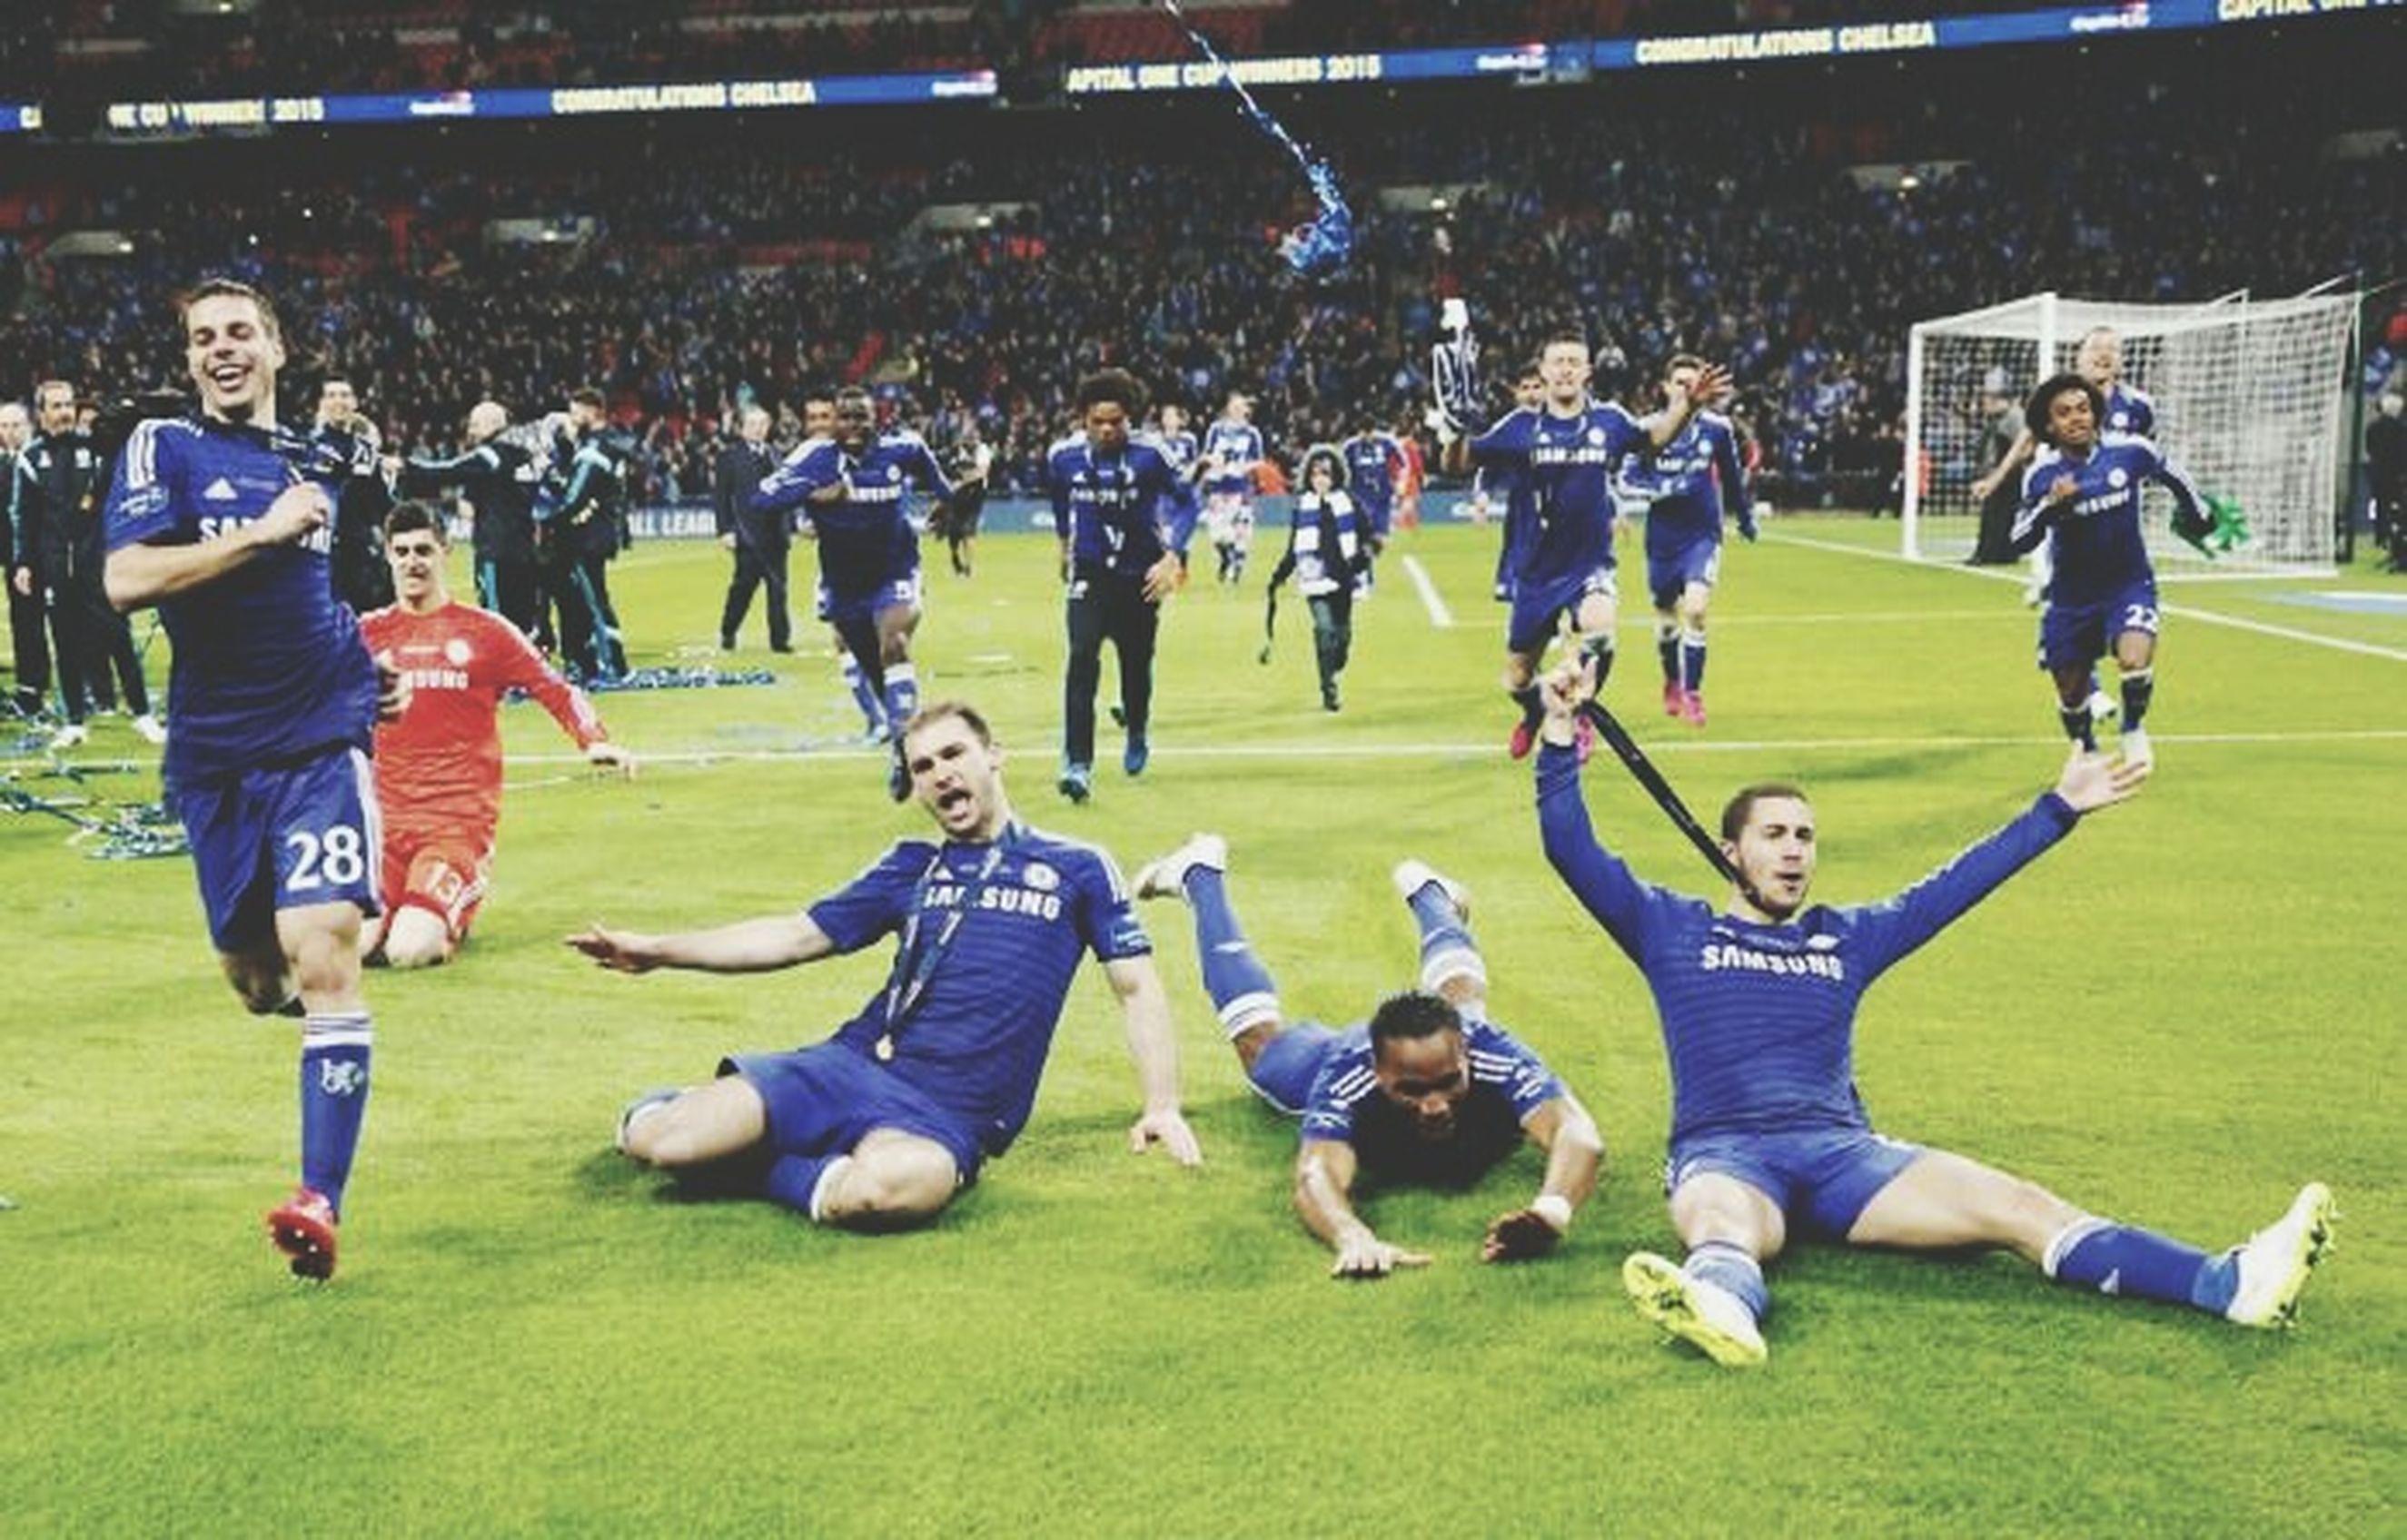 Chelseafc Capitalonecup winner